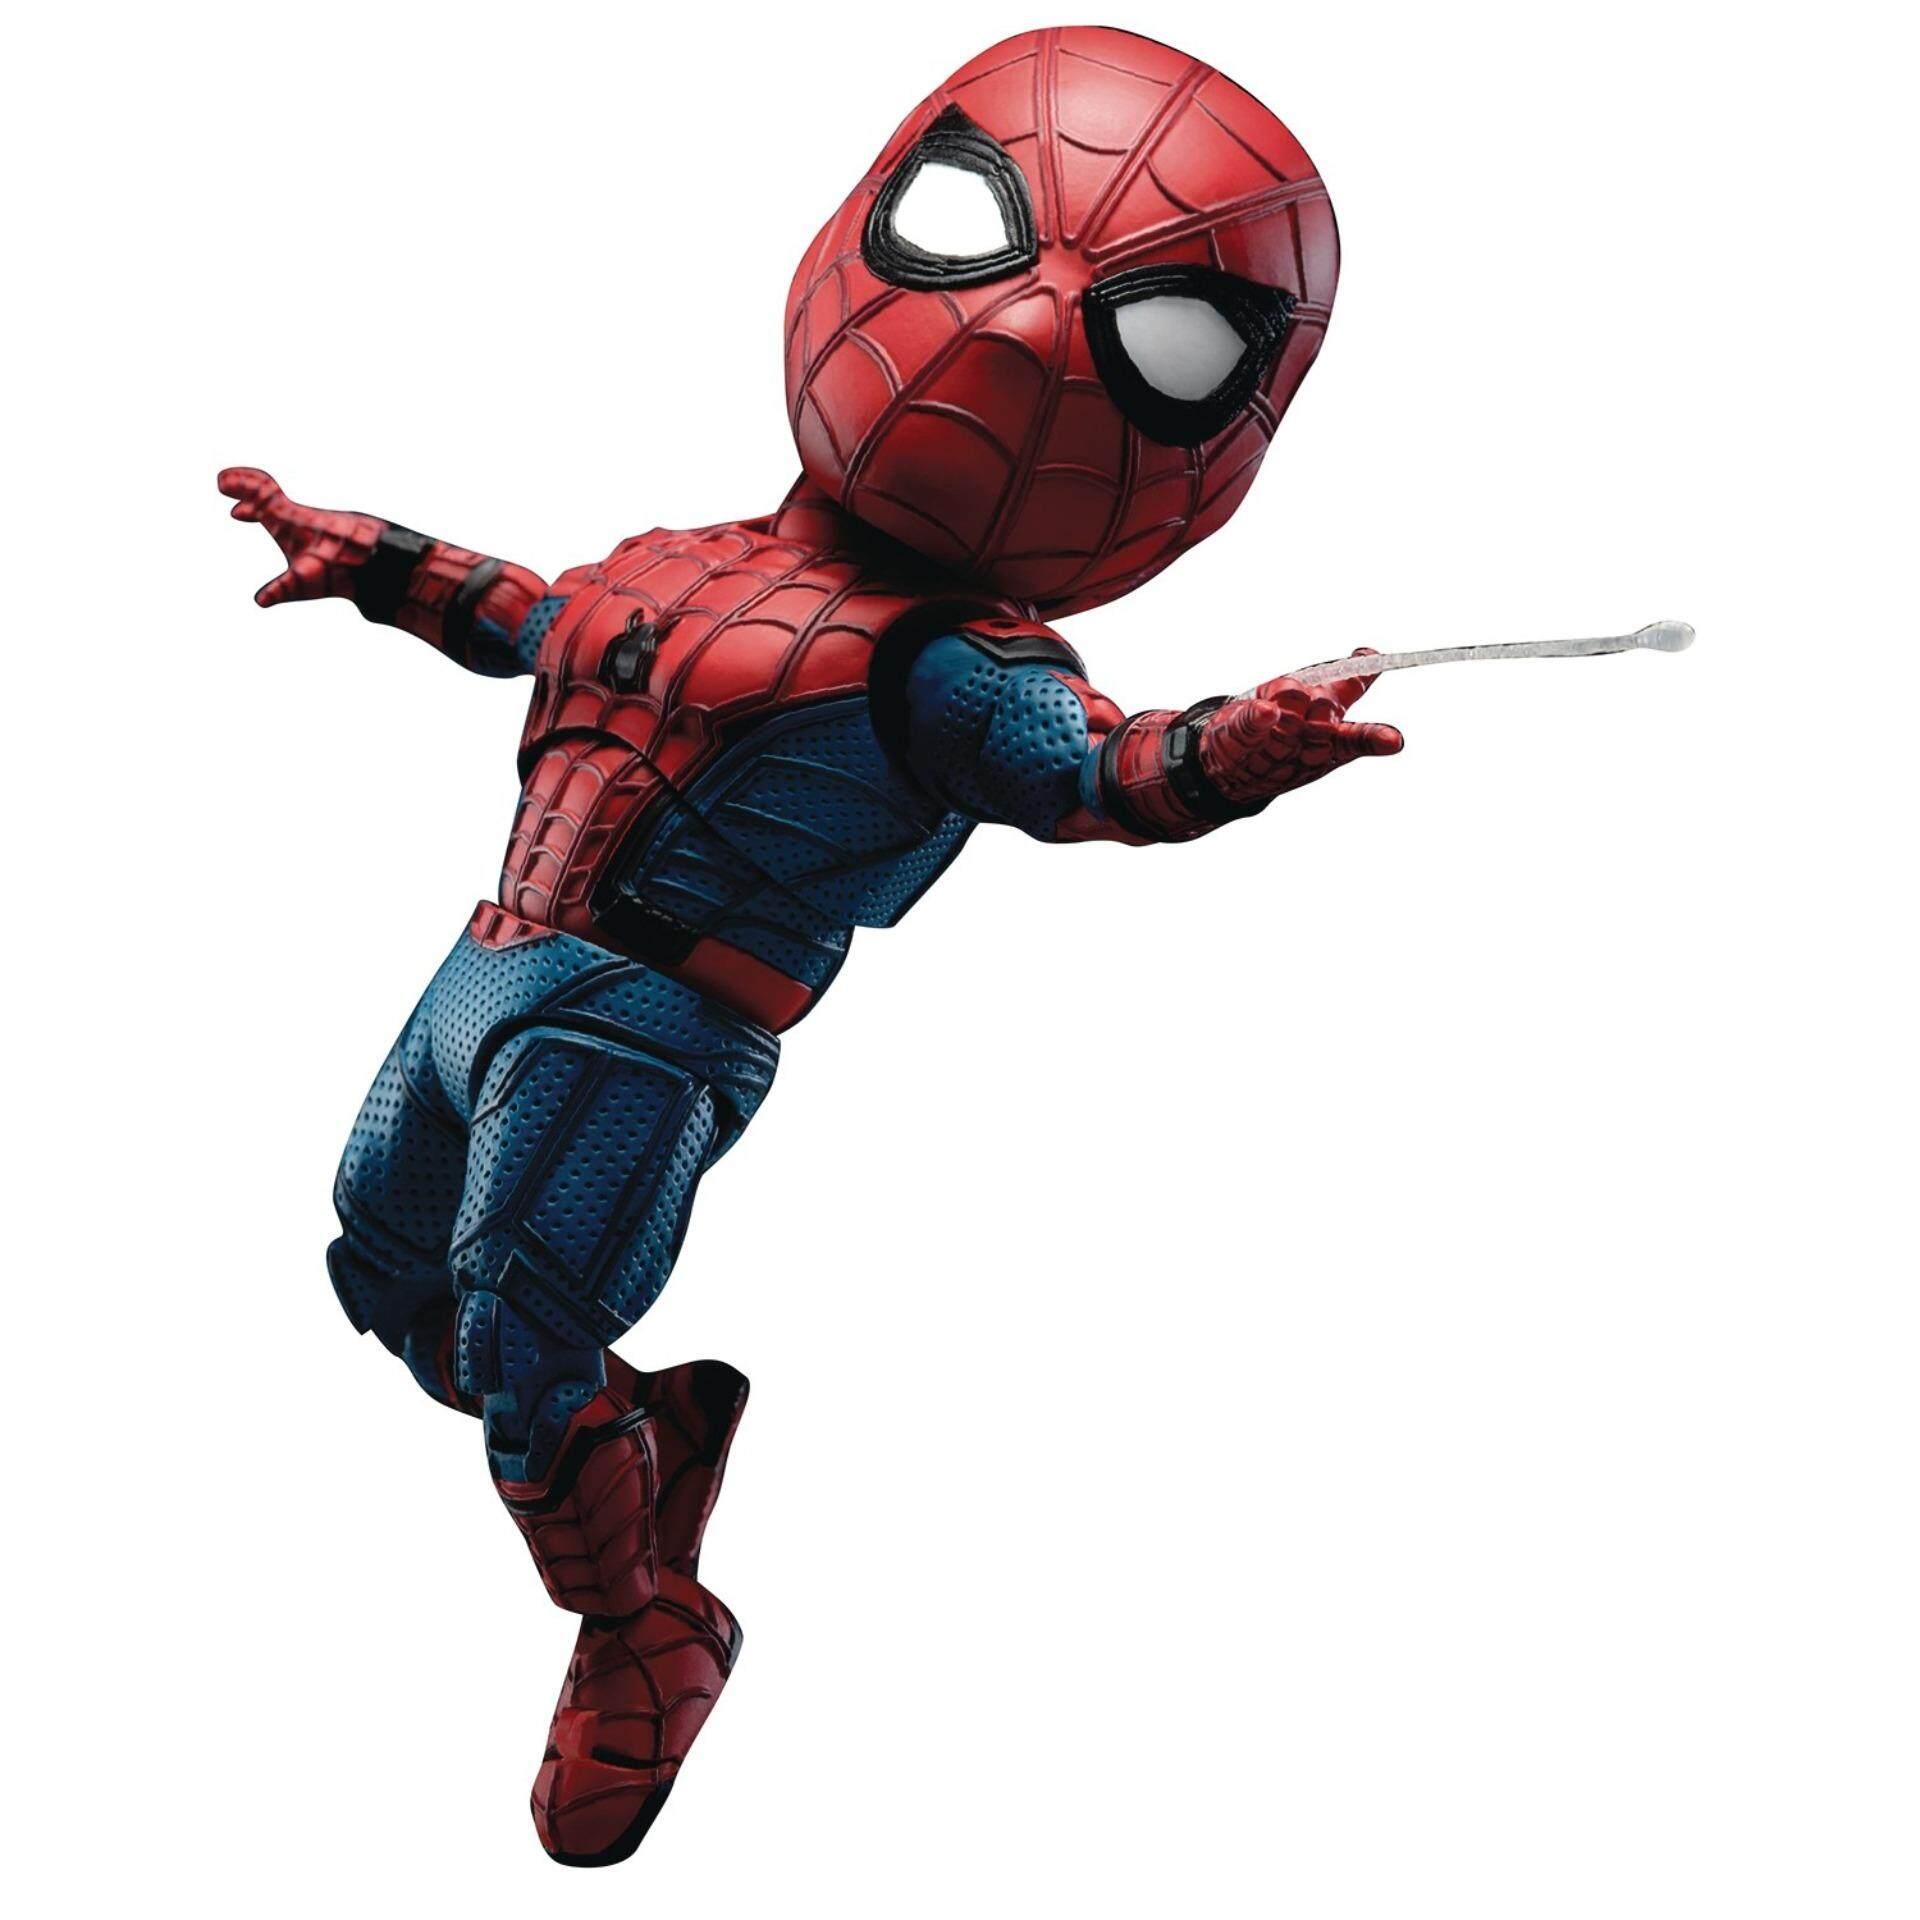 Beast Kingdom Spider-Man: Egg Attack Action - Homecoming Spider-Man (Backpack) (EAA-051) - Mainan Kanak Kanak Lelaki